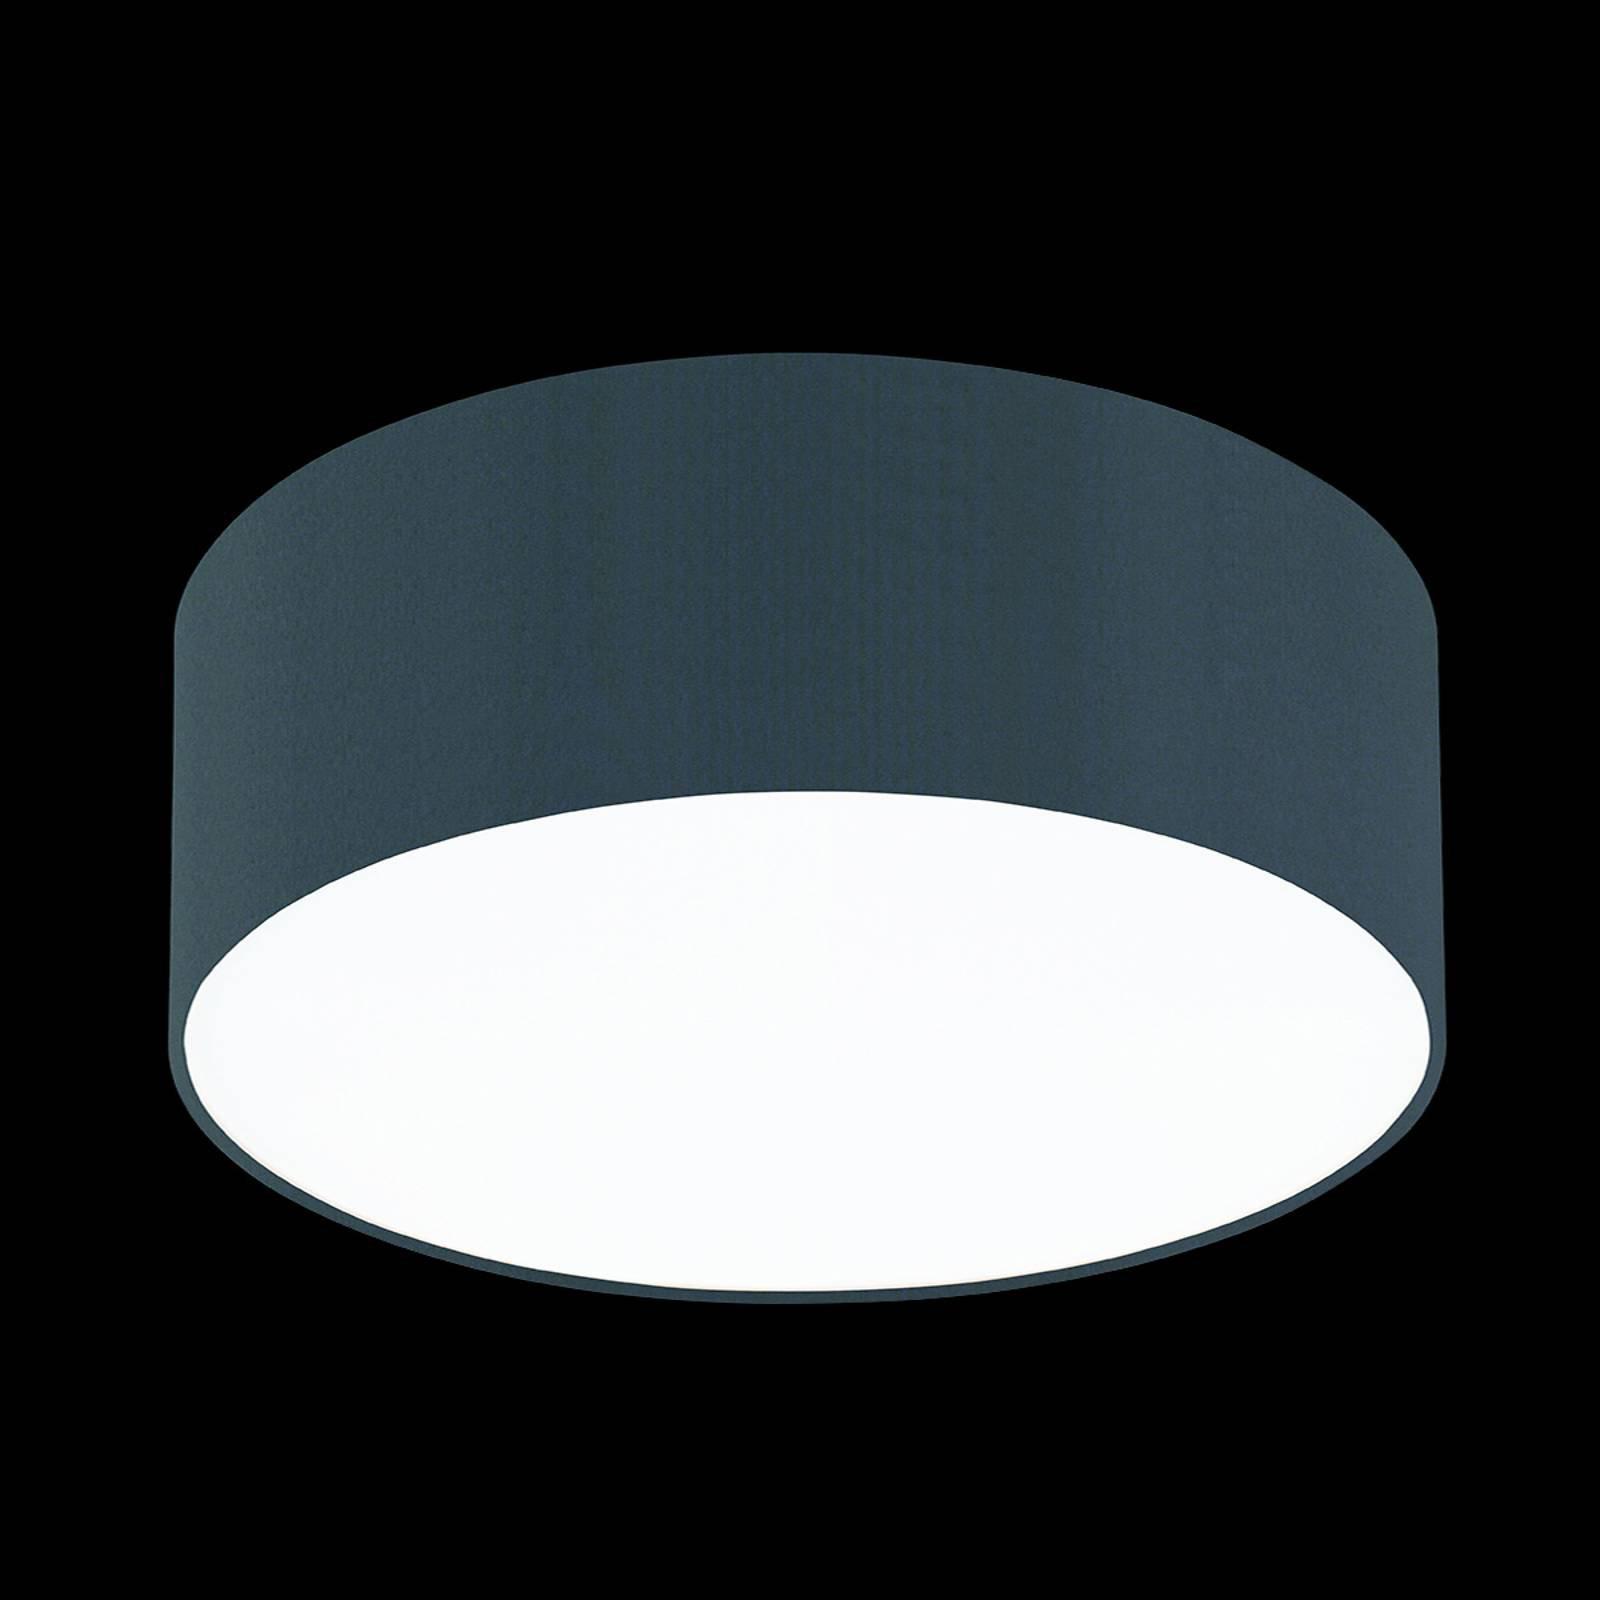 Skifergrå taklampe Mara, 50 cm